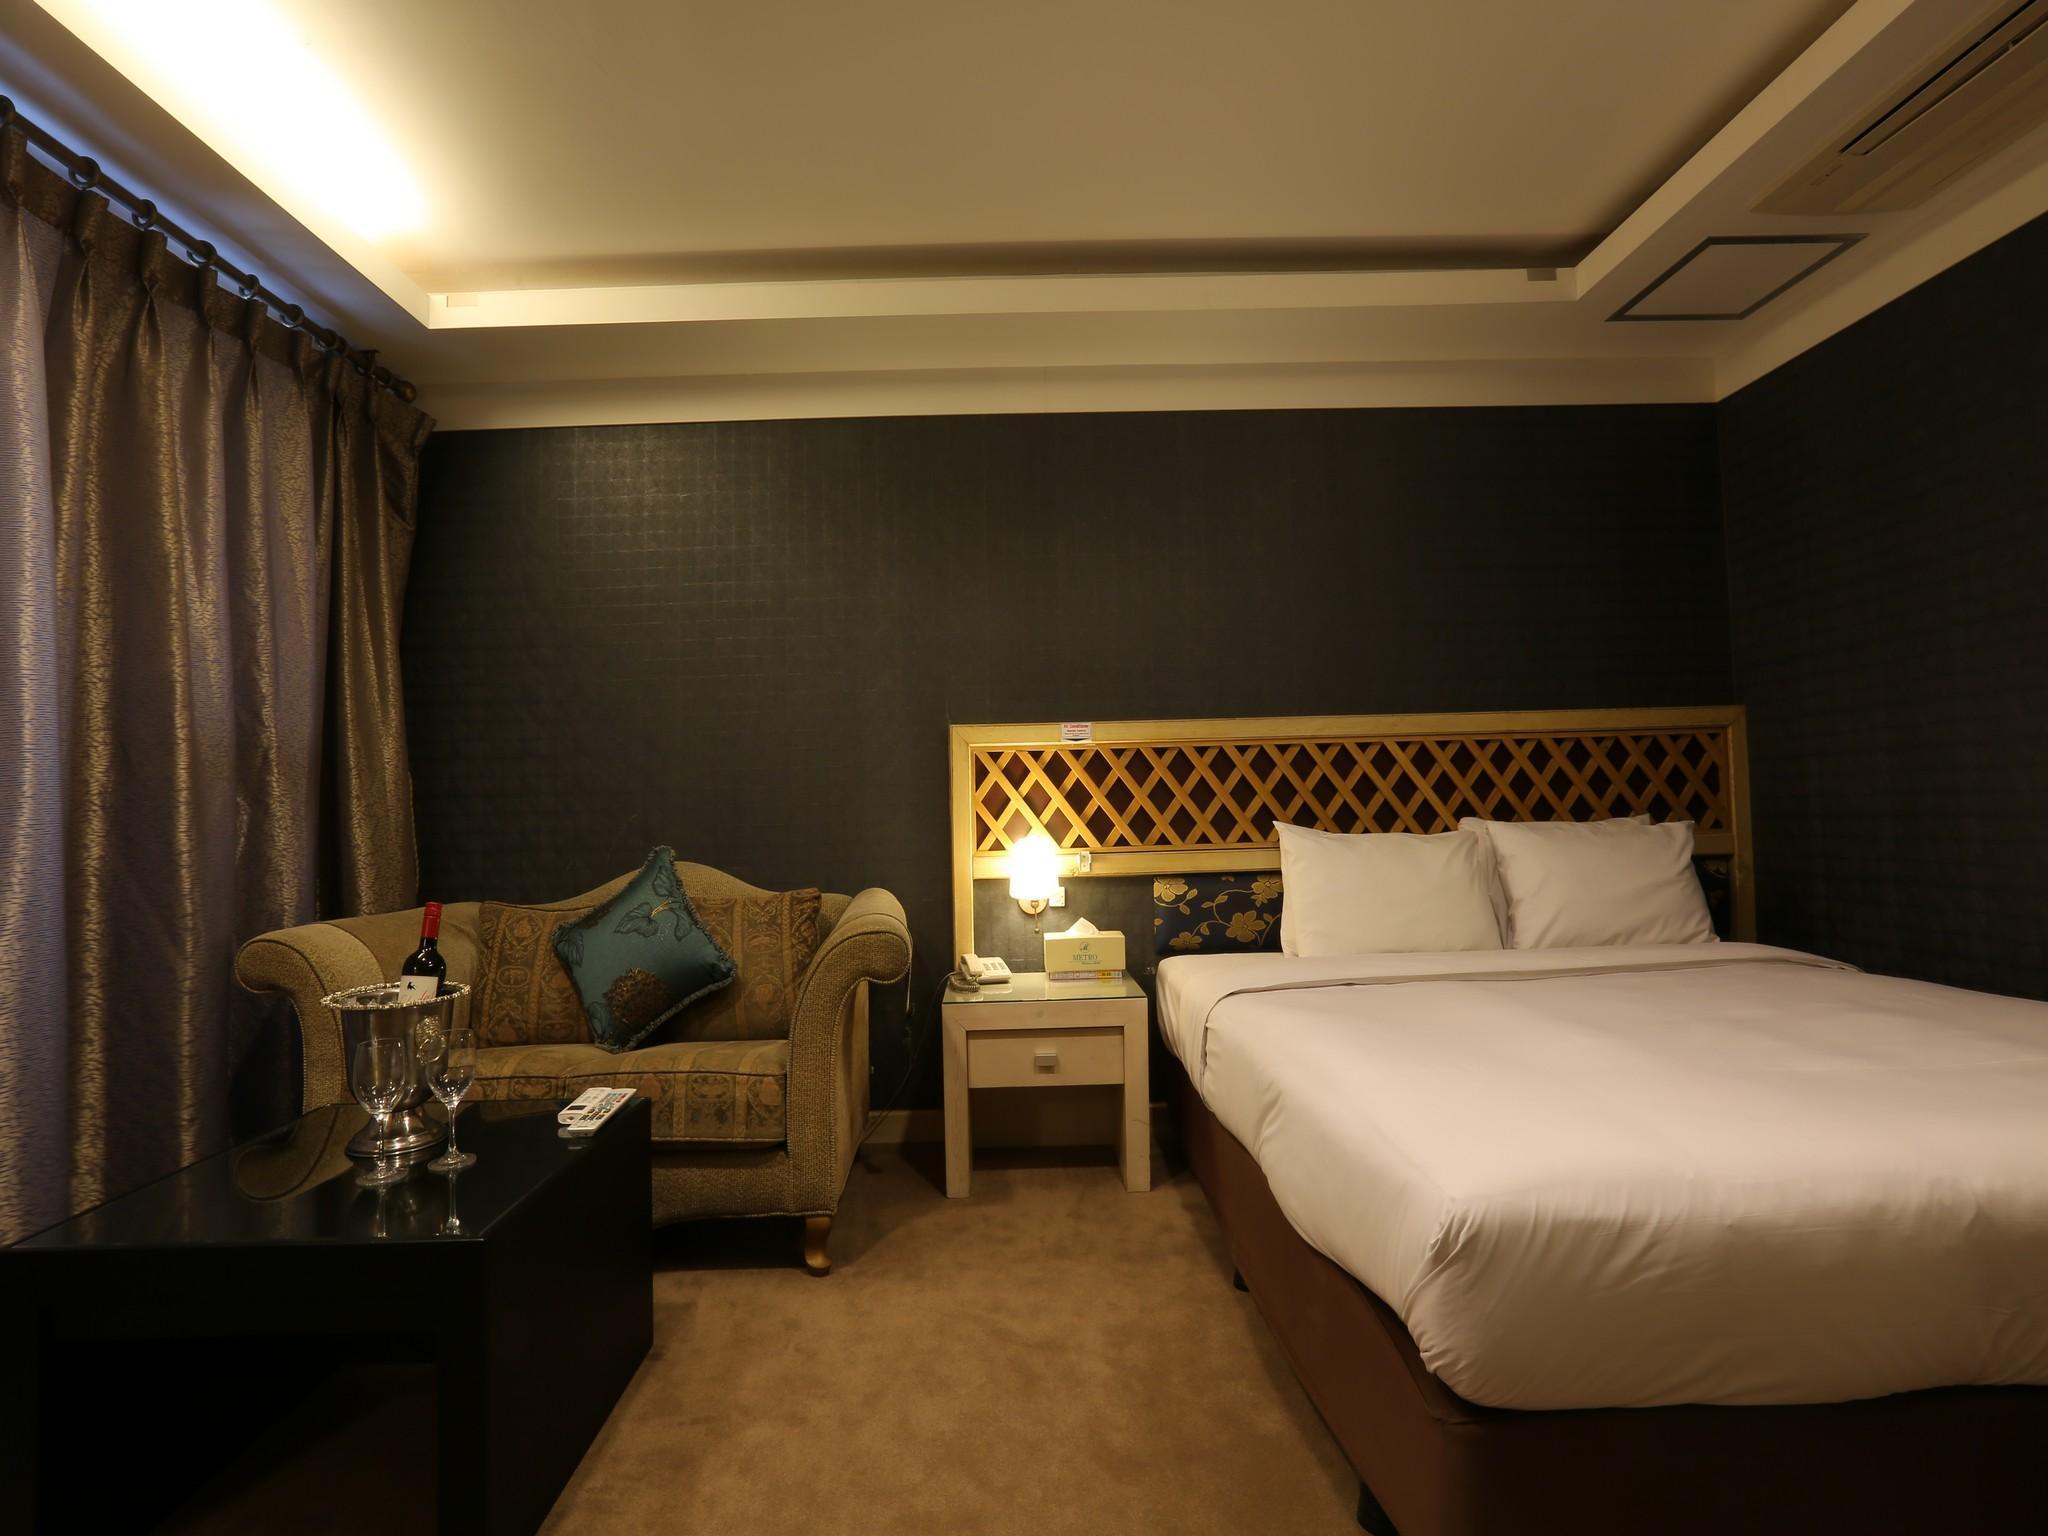 Metro Tourist Hotel Cheonan, Cheonan